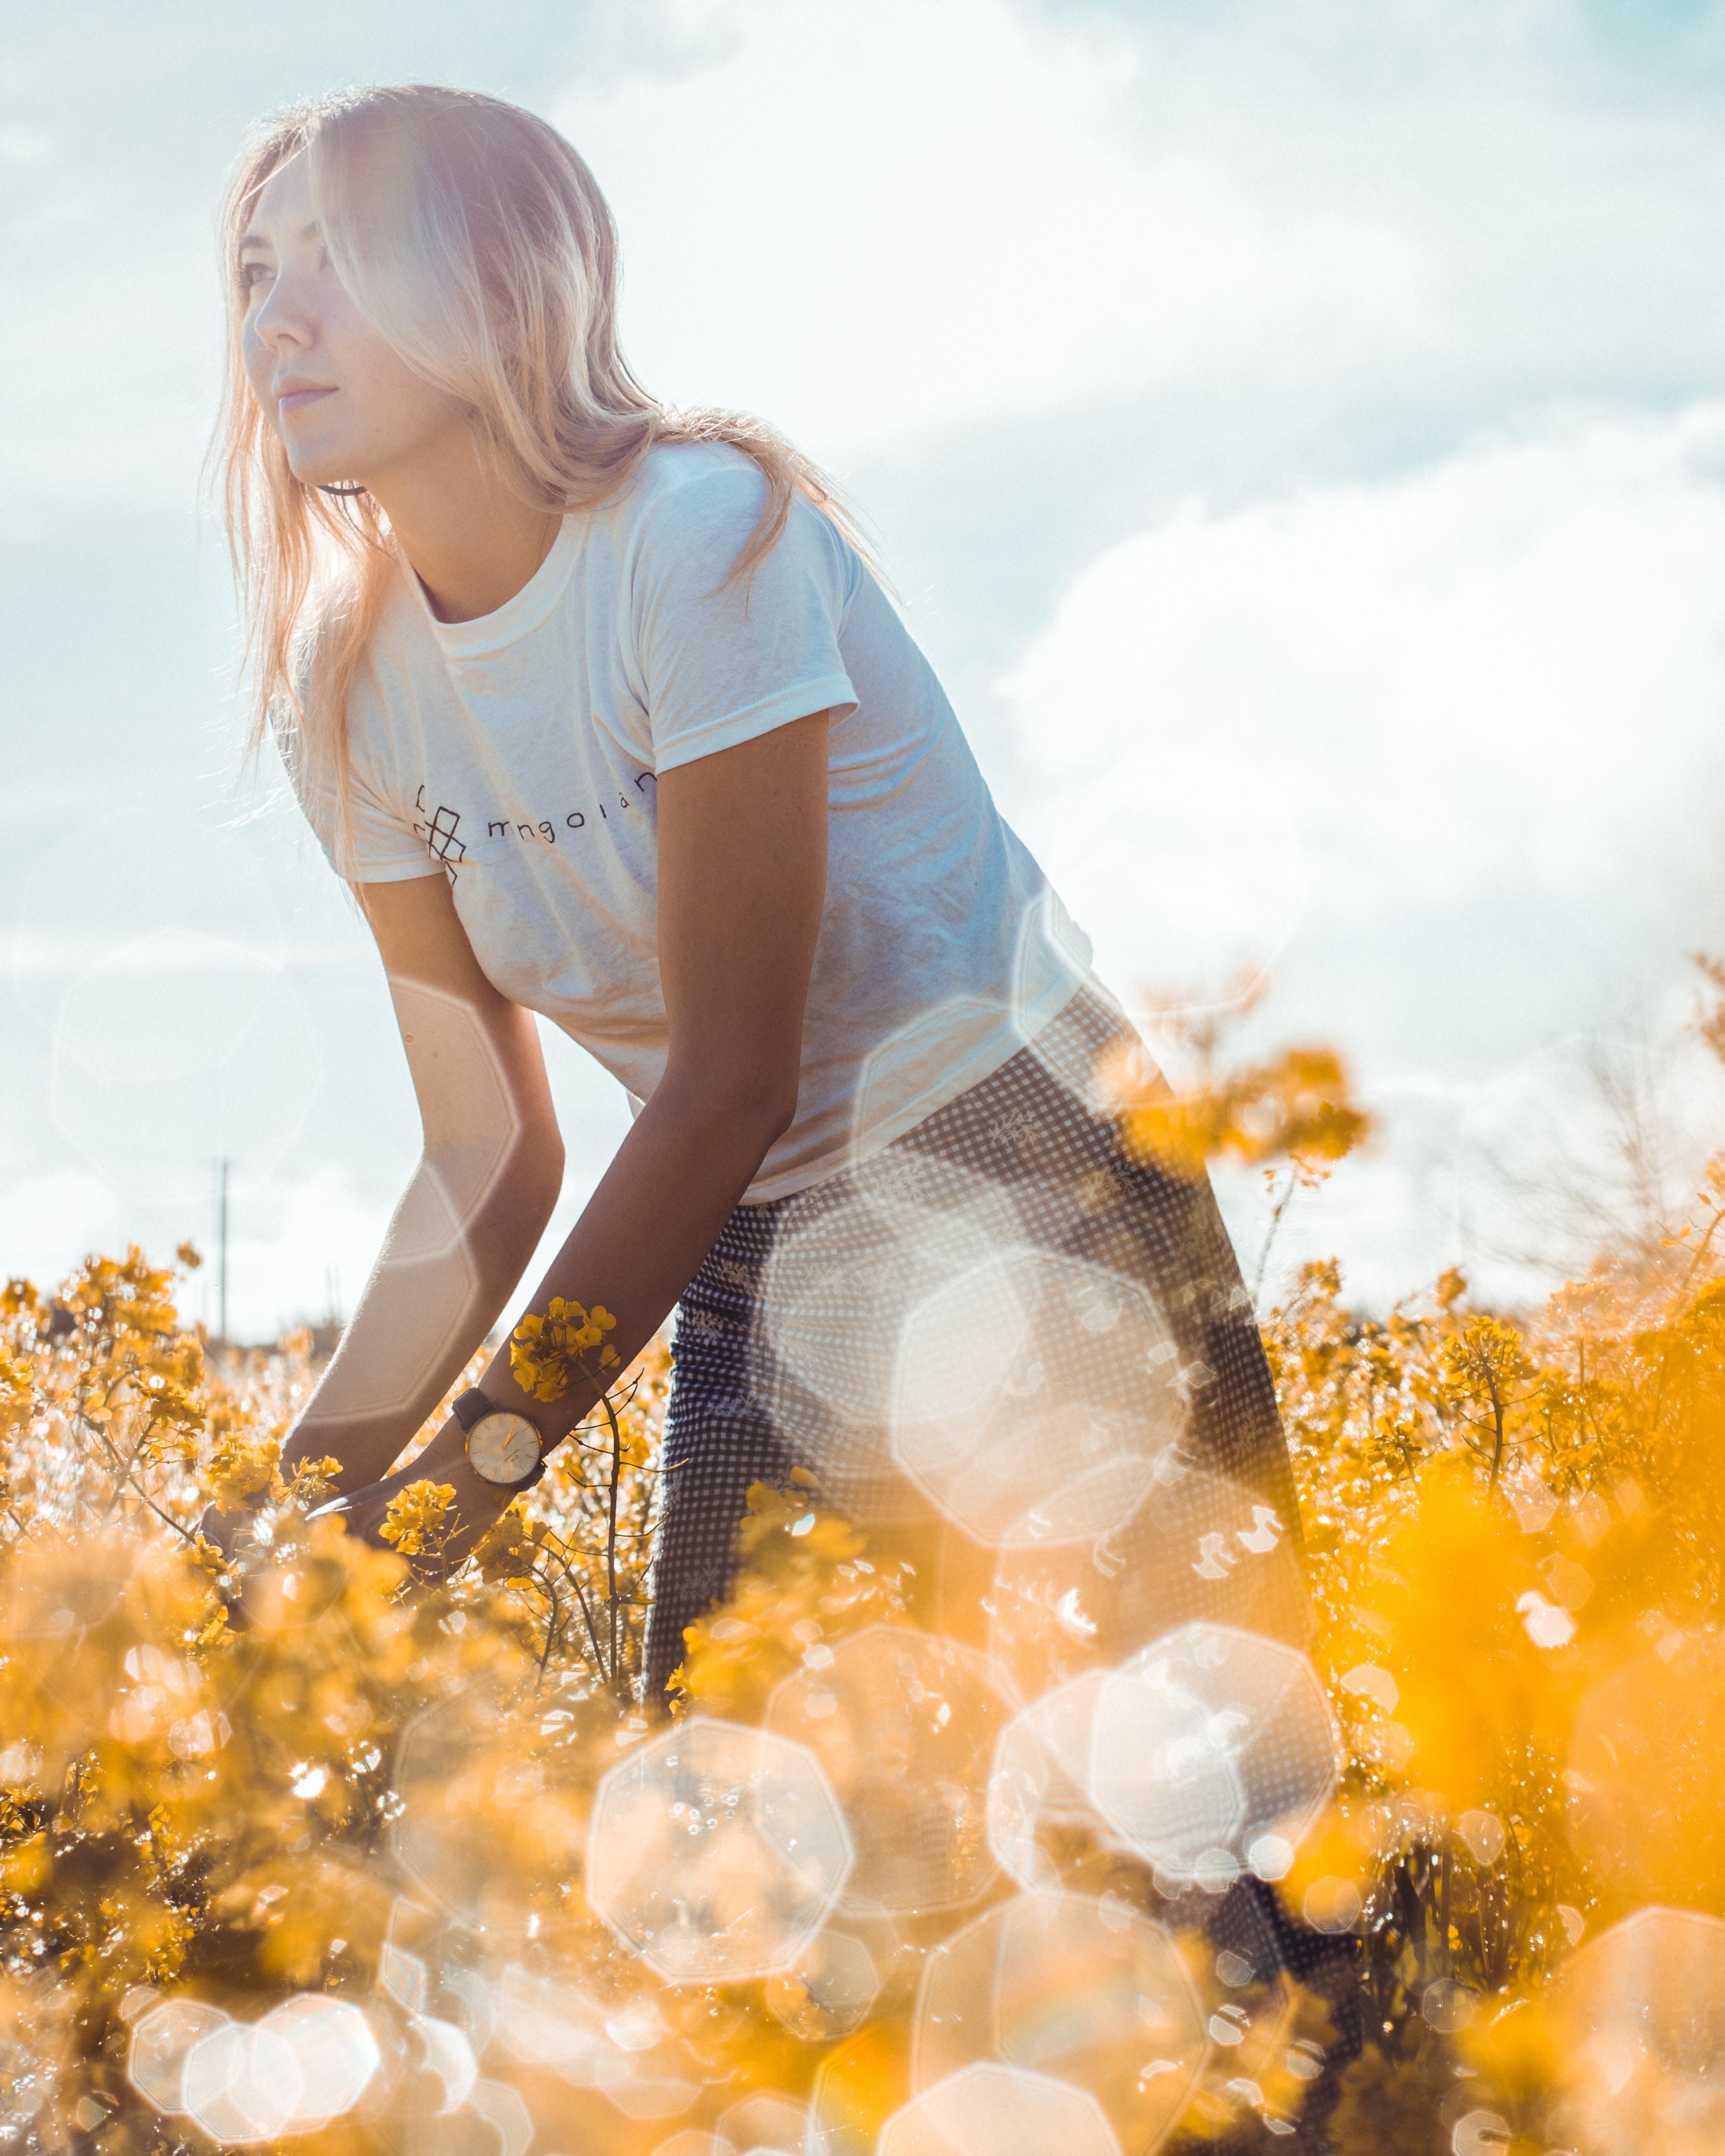 woman standing on yellow flower field